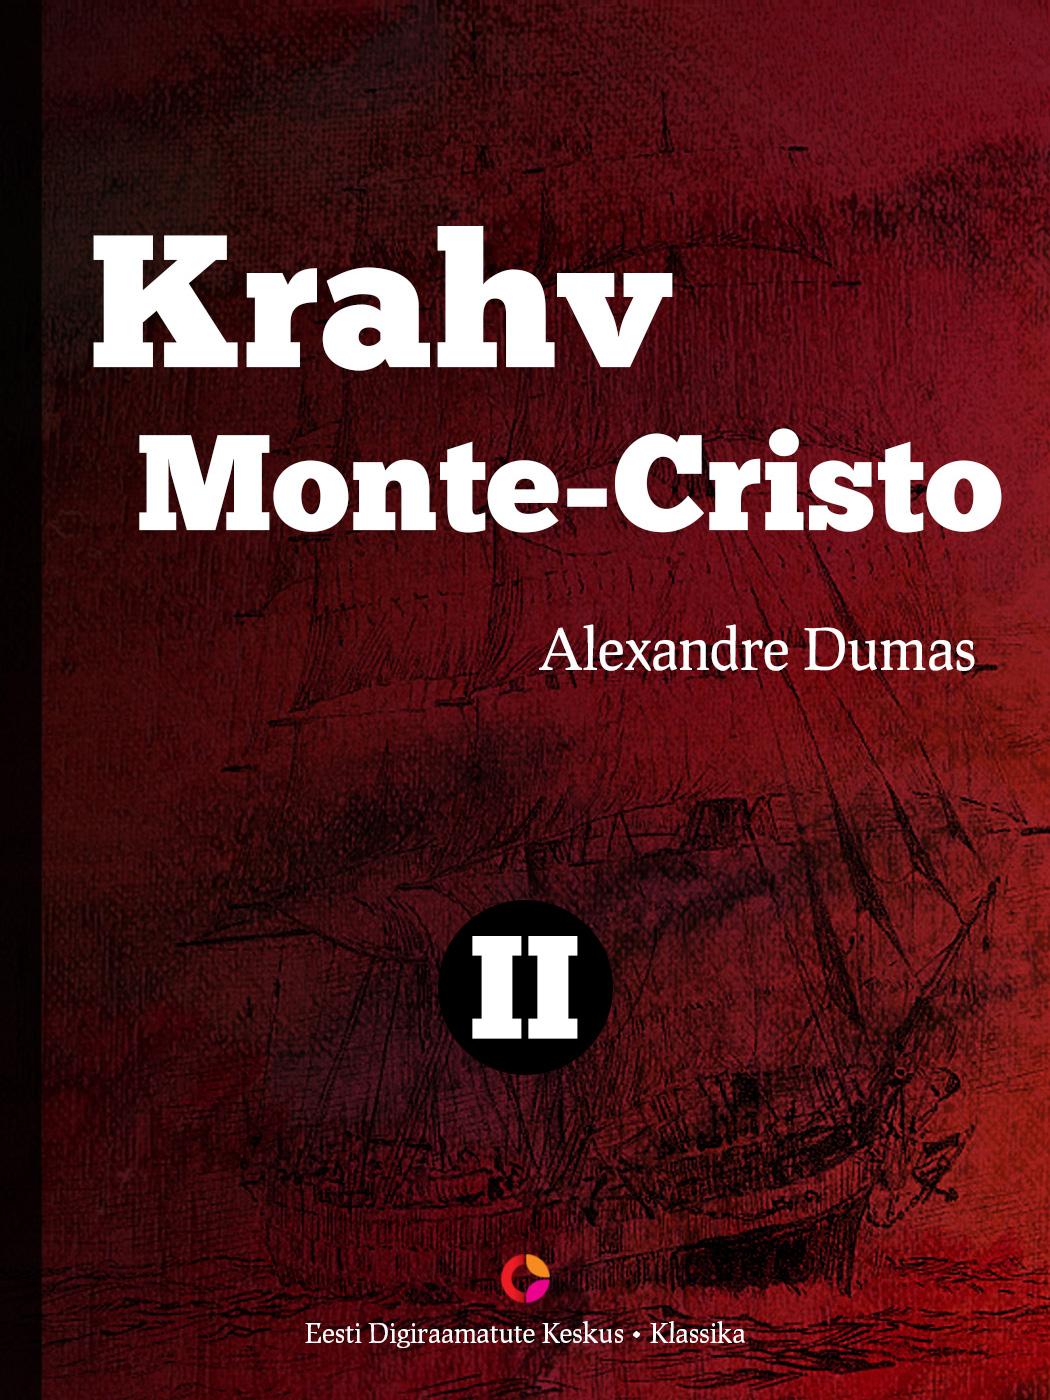 Alexandre Dumas Krahv Monte-Cristo. 2. osa the treasure of monte cristo